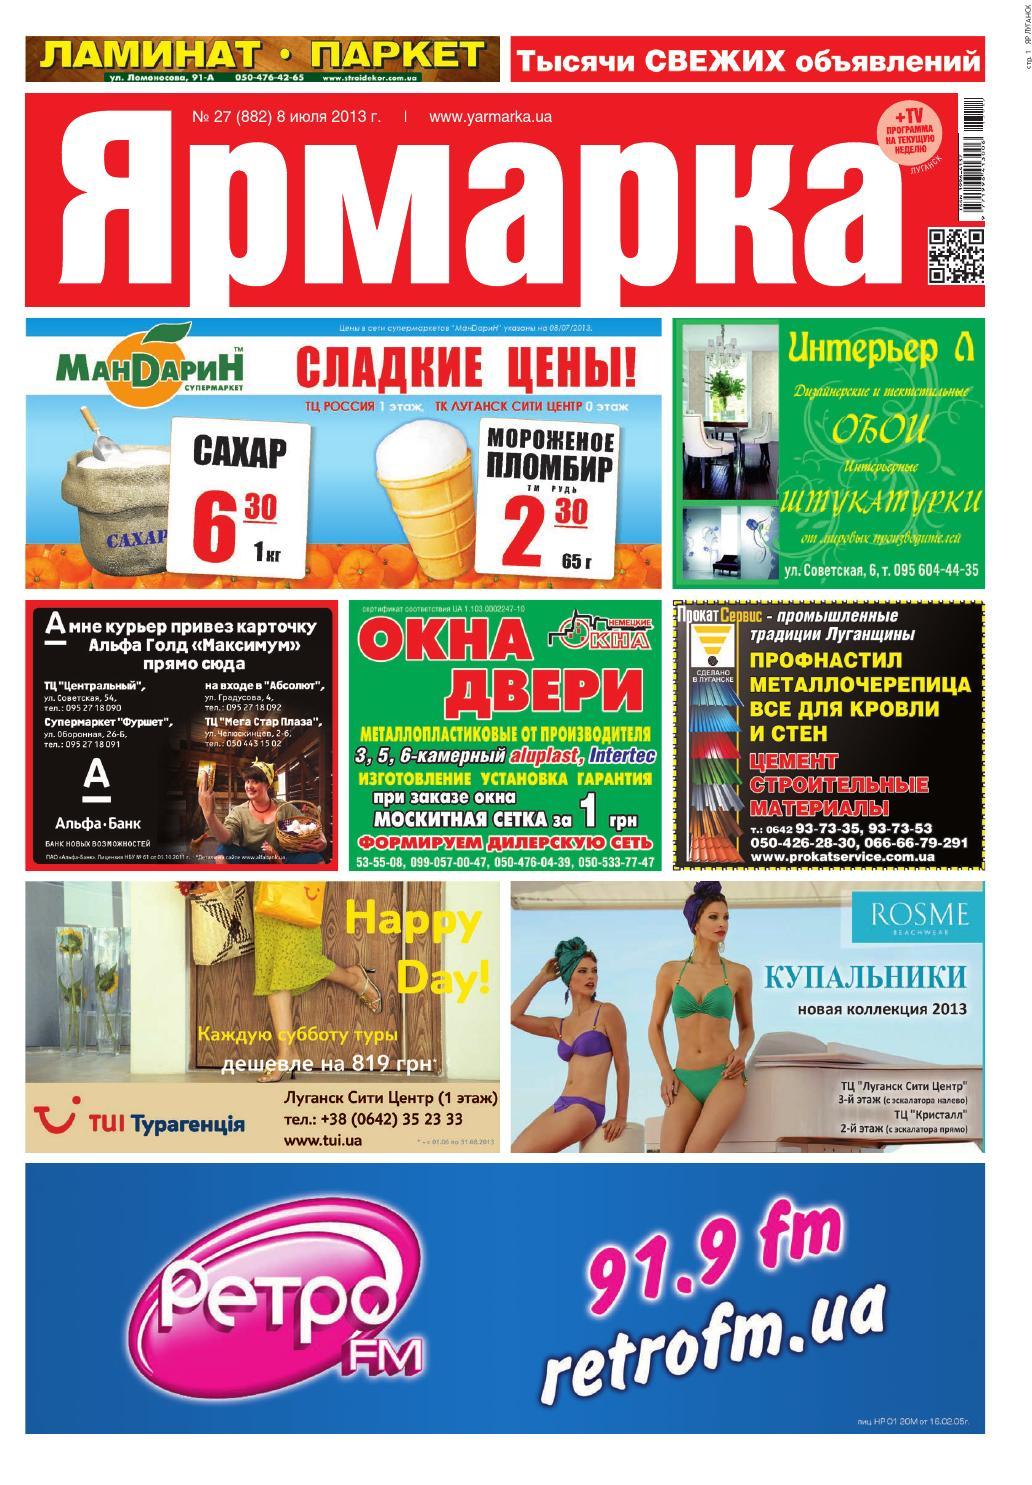 Yarmarka lugansk 08 07 2013 by besplatka ukraine - issuu 3073aac6c2d